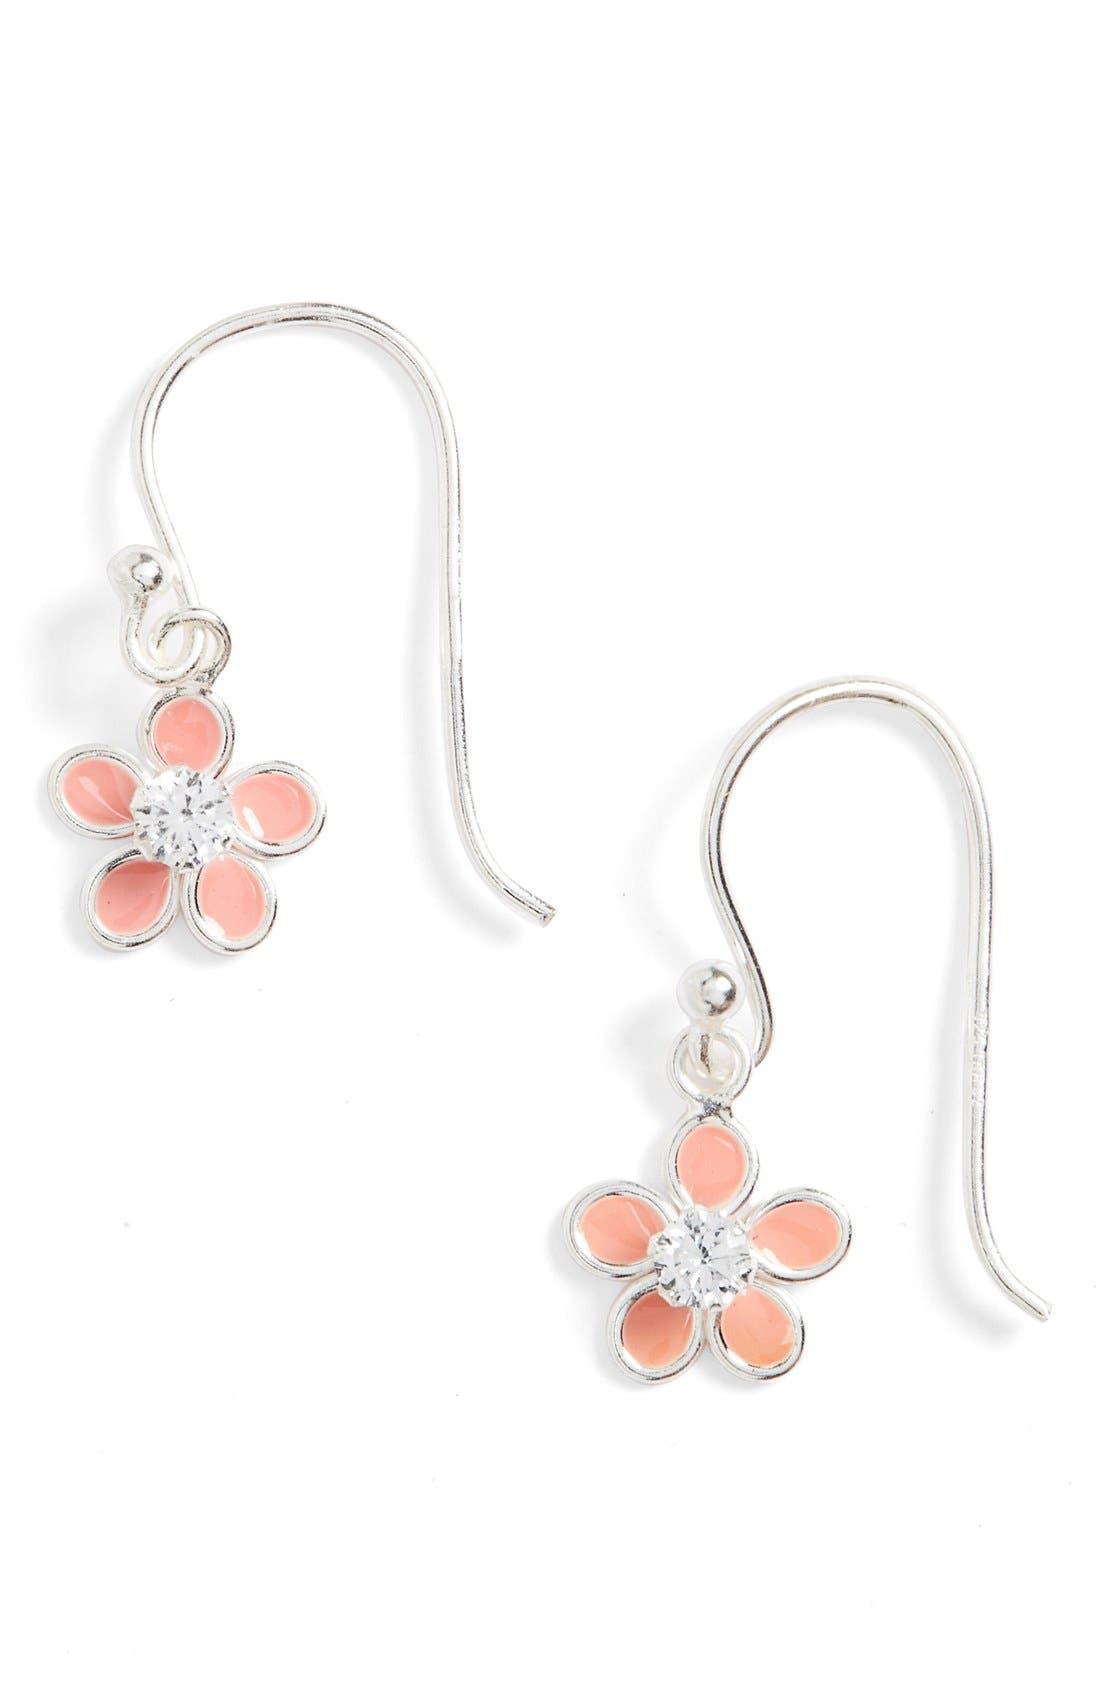 'Flower' Earrings,                             Main thumbnail 1, color,                             SILVER